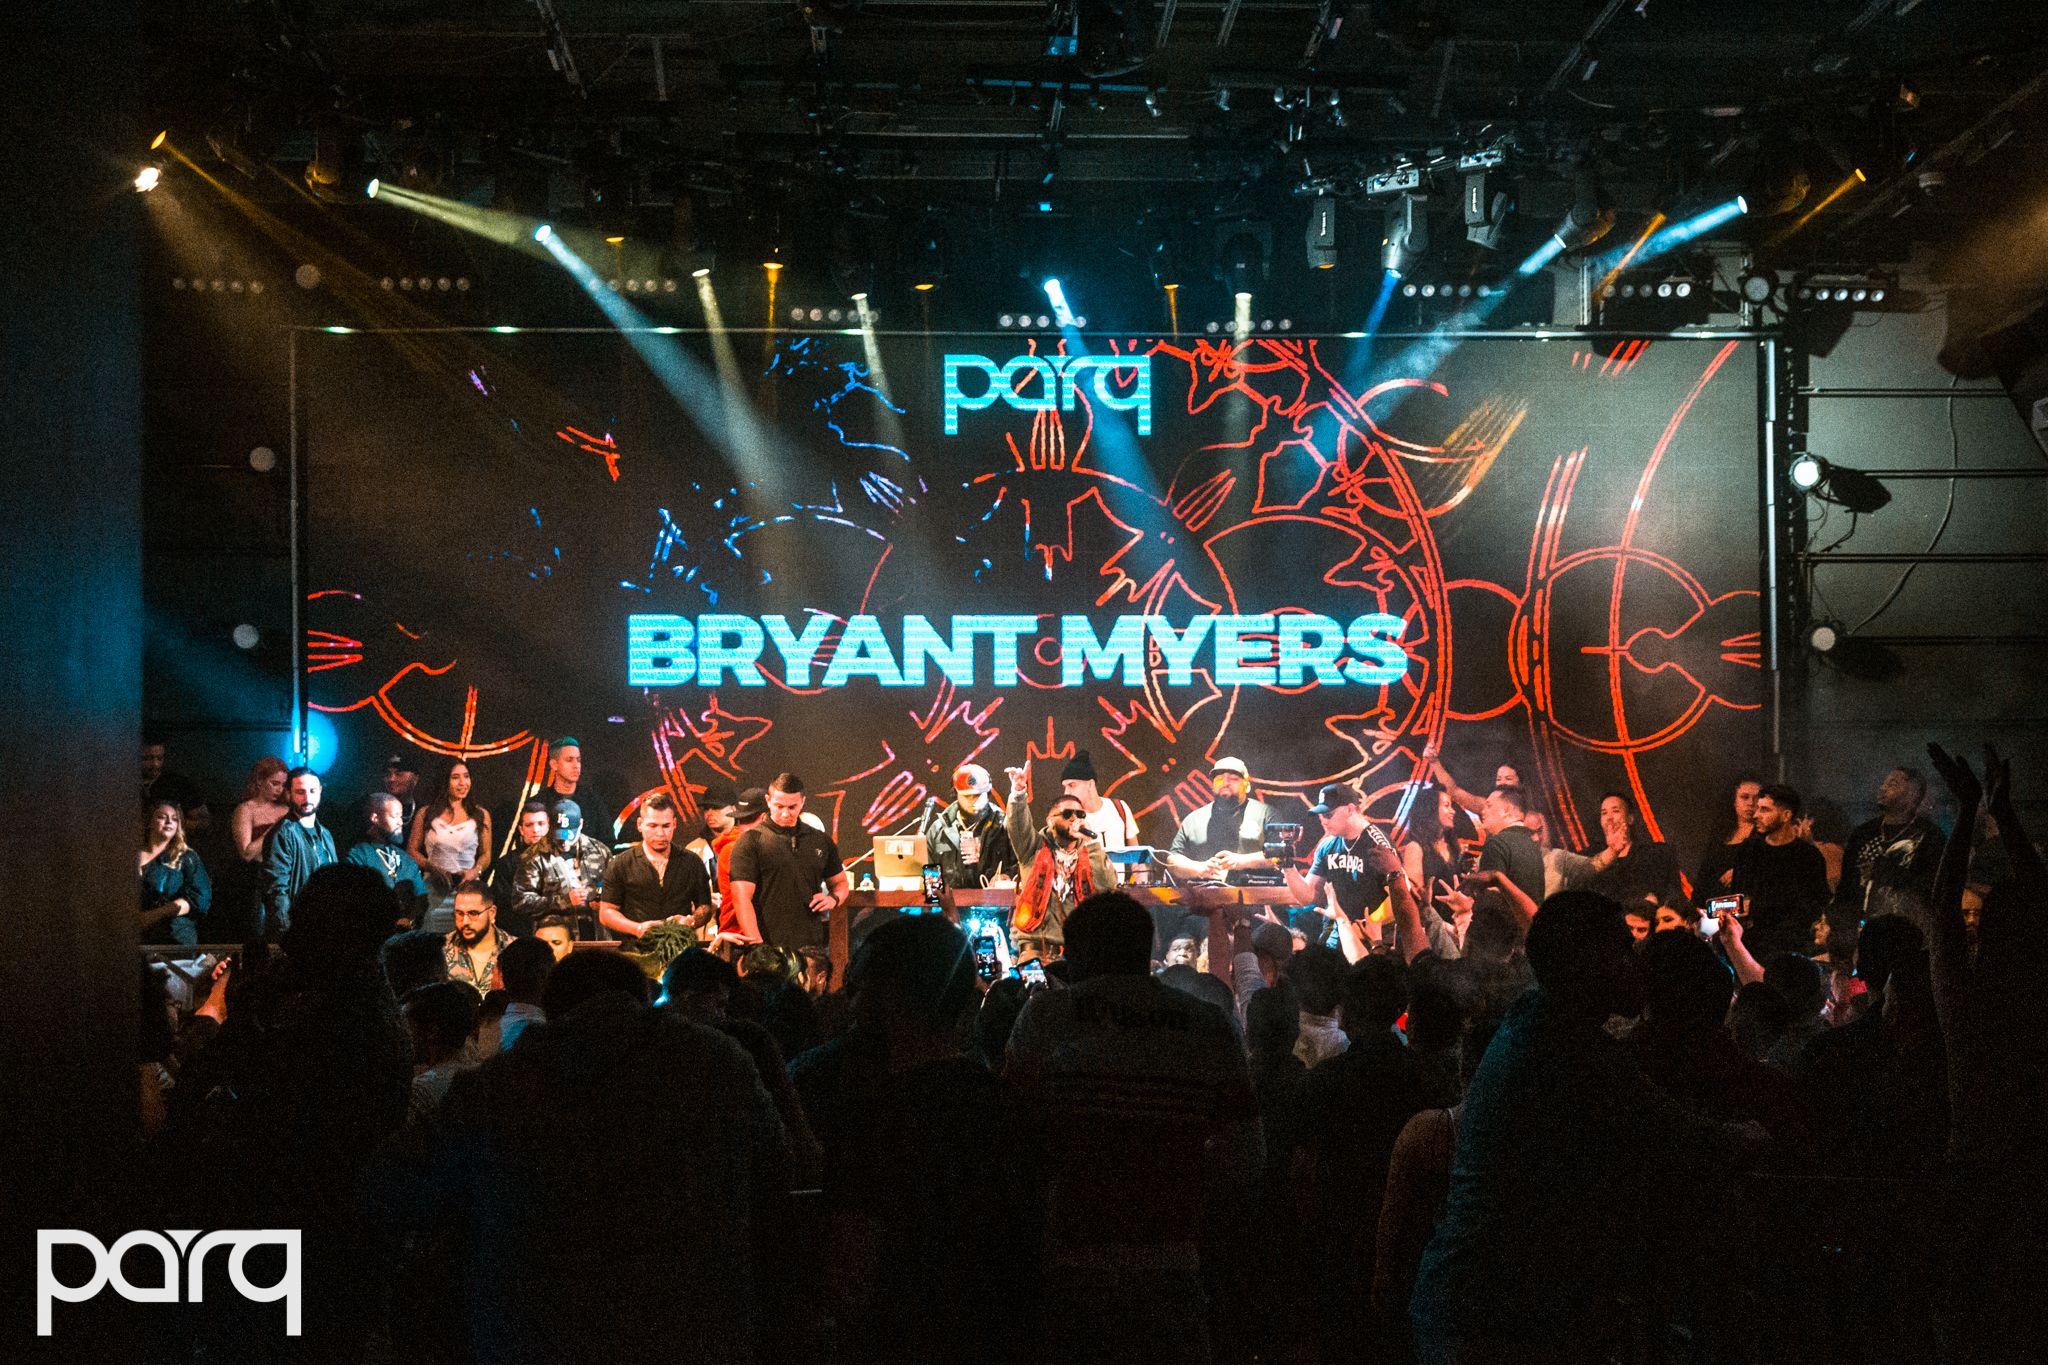 12.13.19 Parq - Bryant Myers-1.jpg